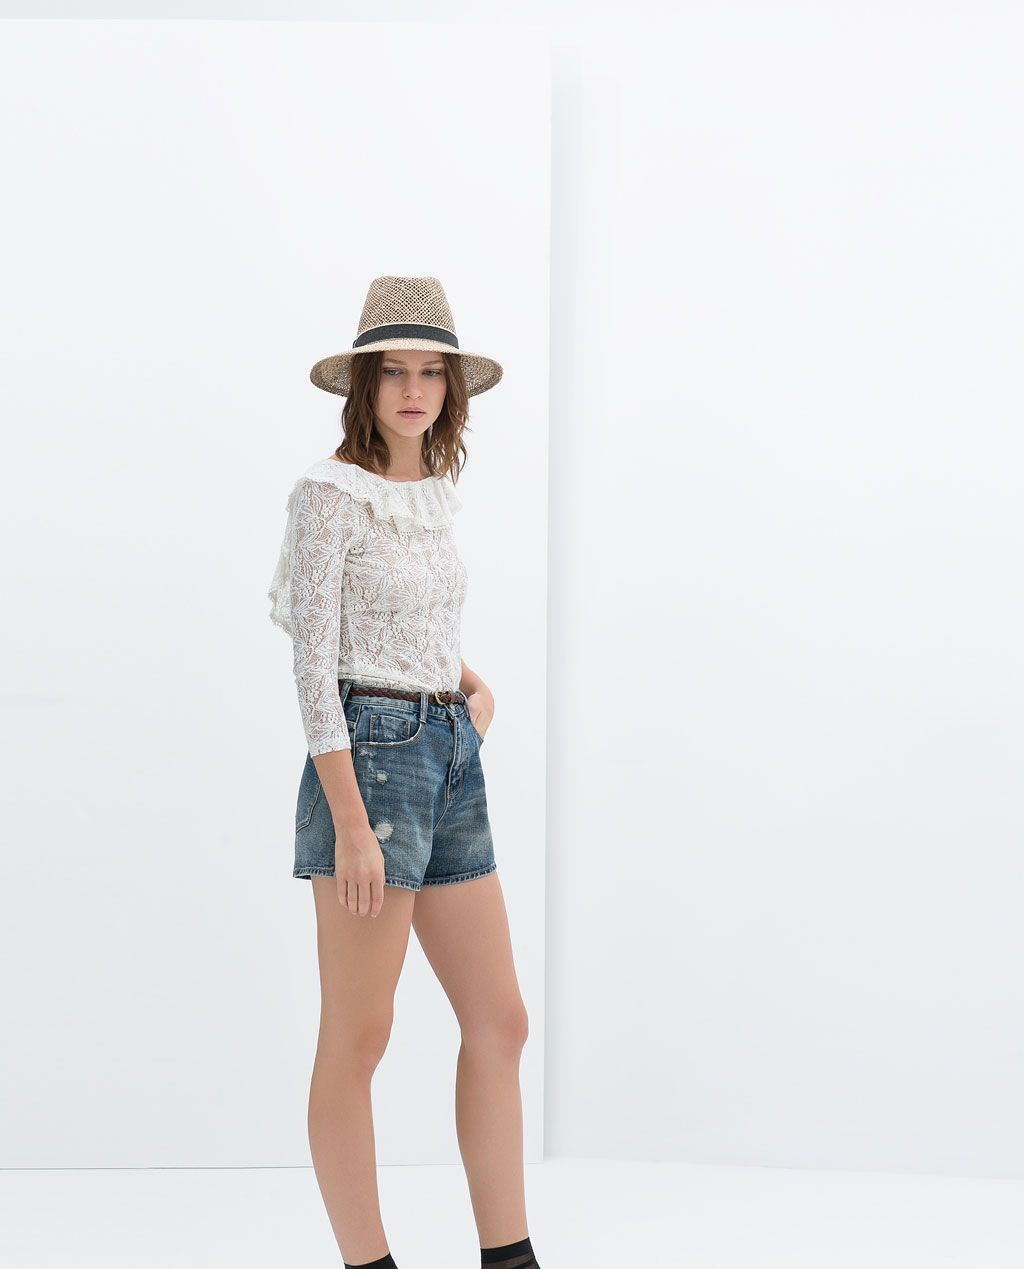 Zara Trf Top Encaje Zara Camisas Encaje